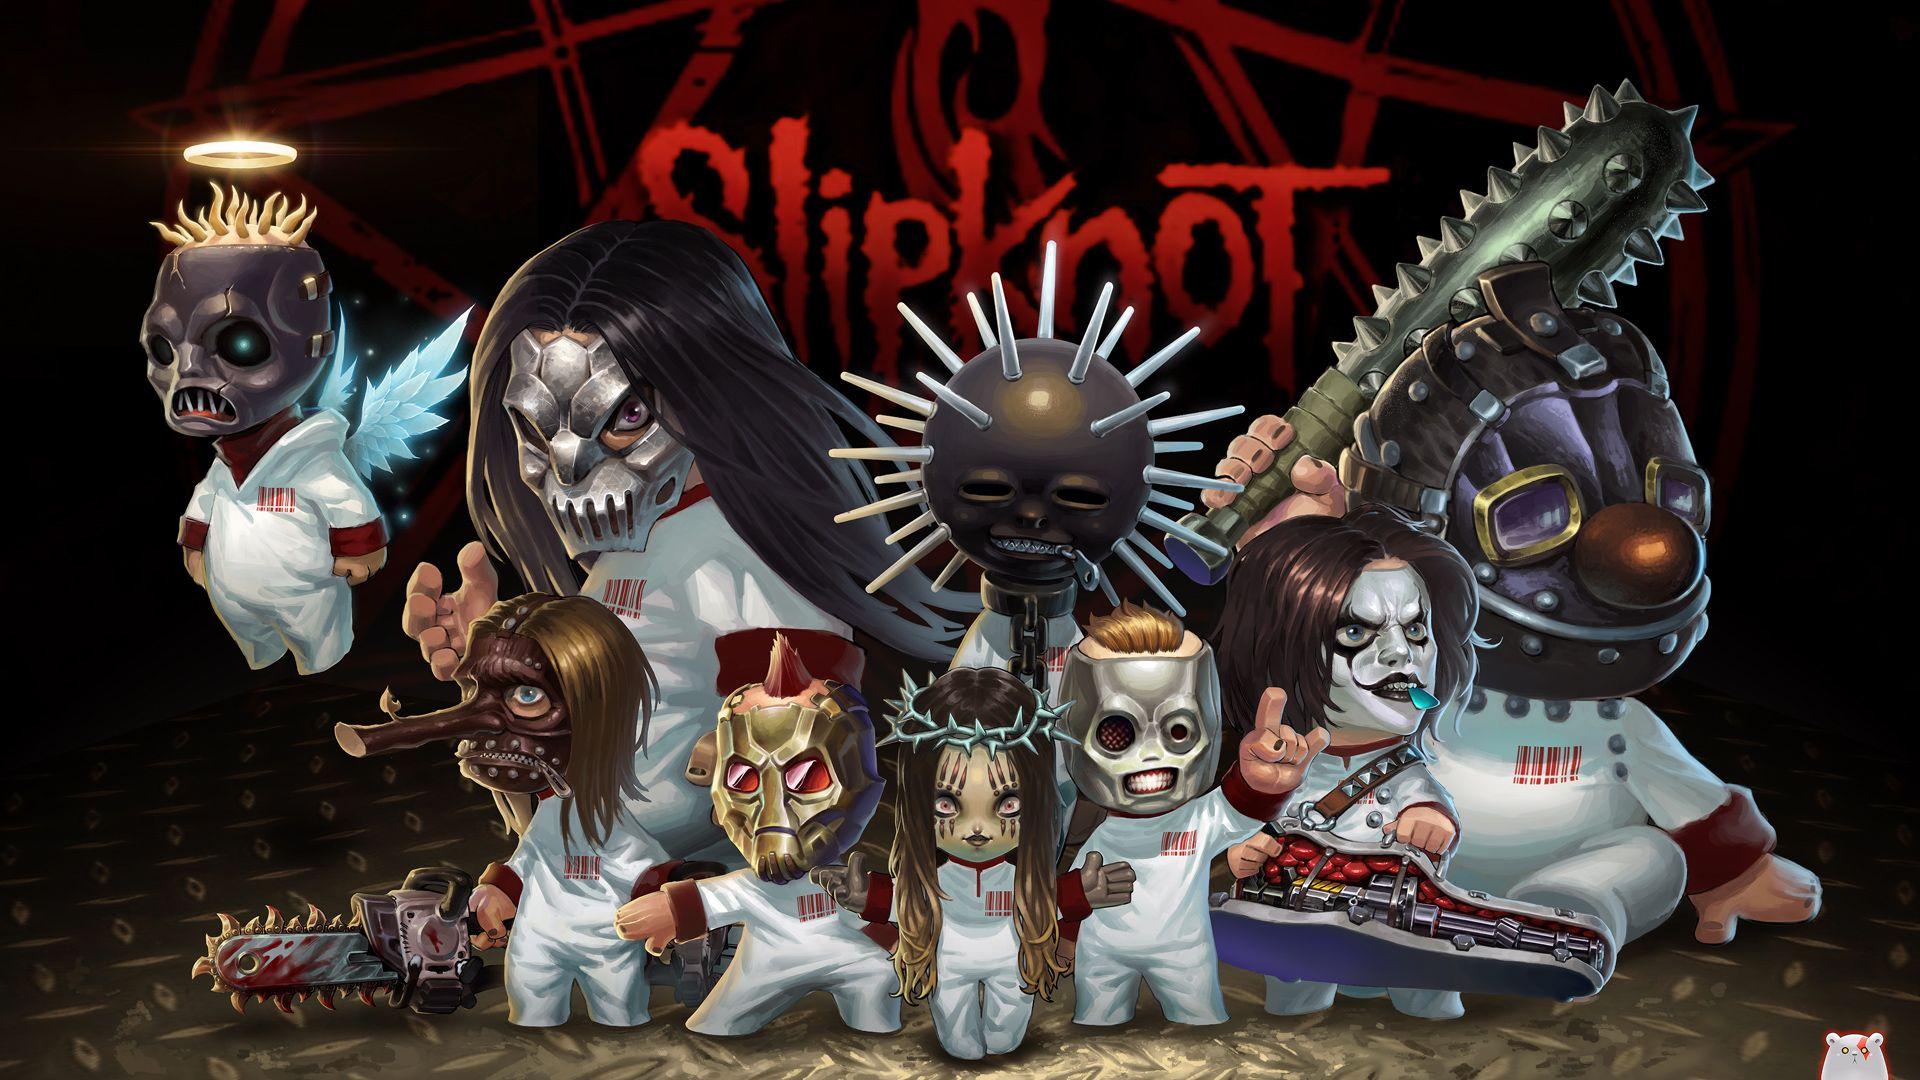 Pin by SER∃NA RAMIREZ |-/ on Slipknot | Slipknot, Heavy metal bands